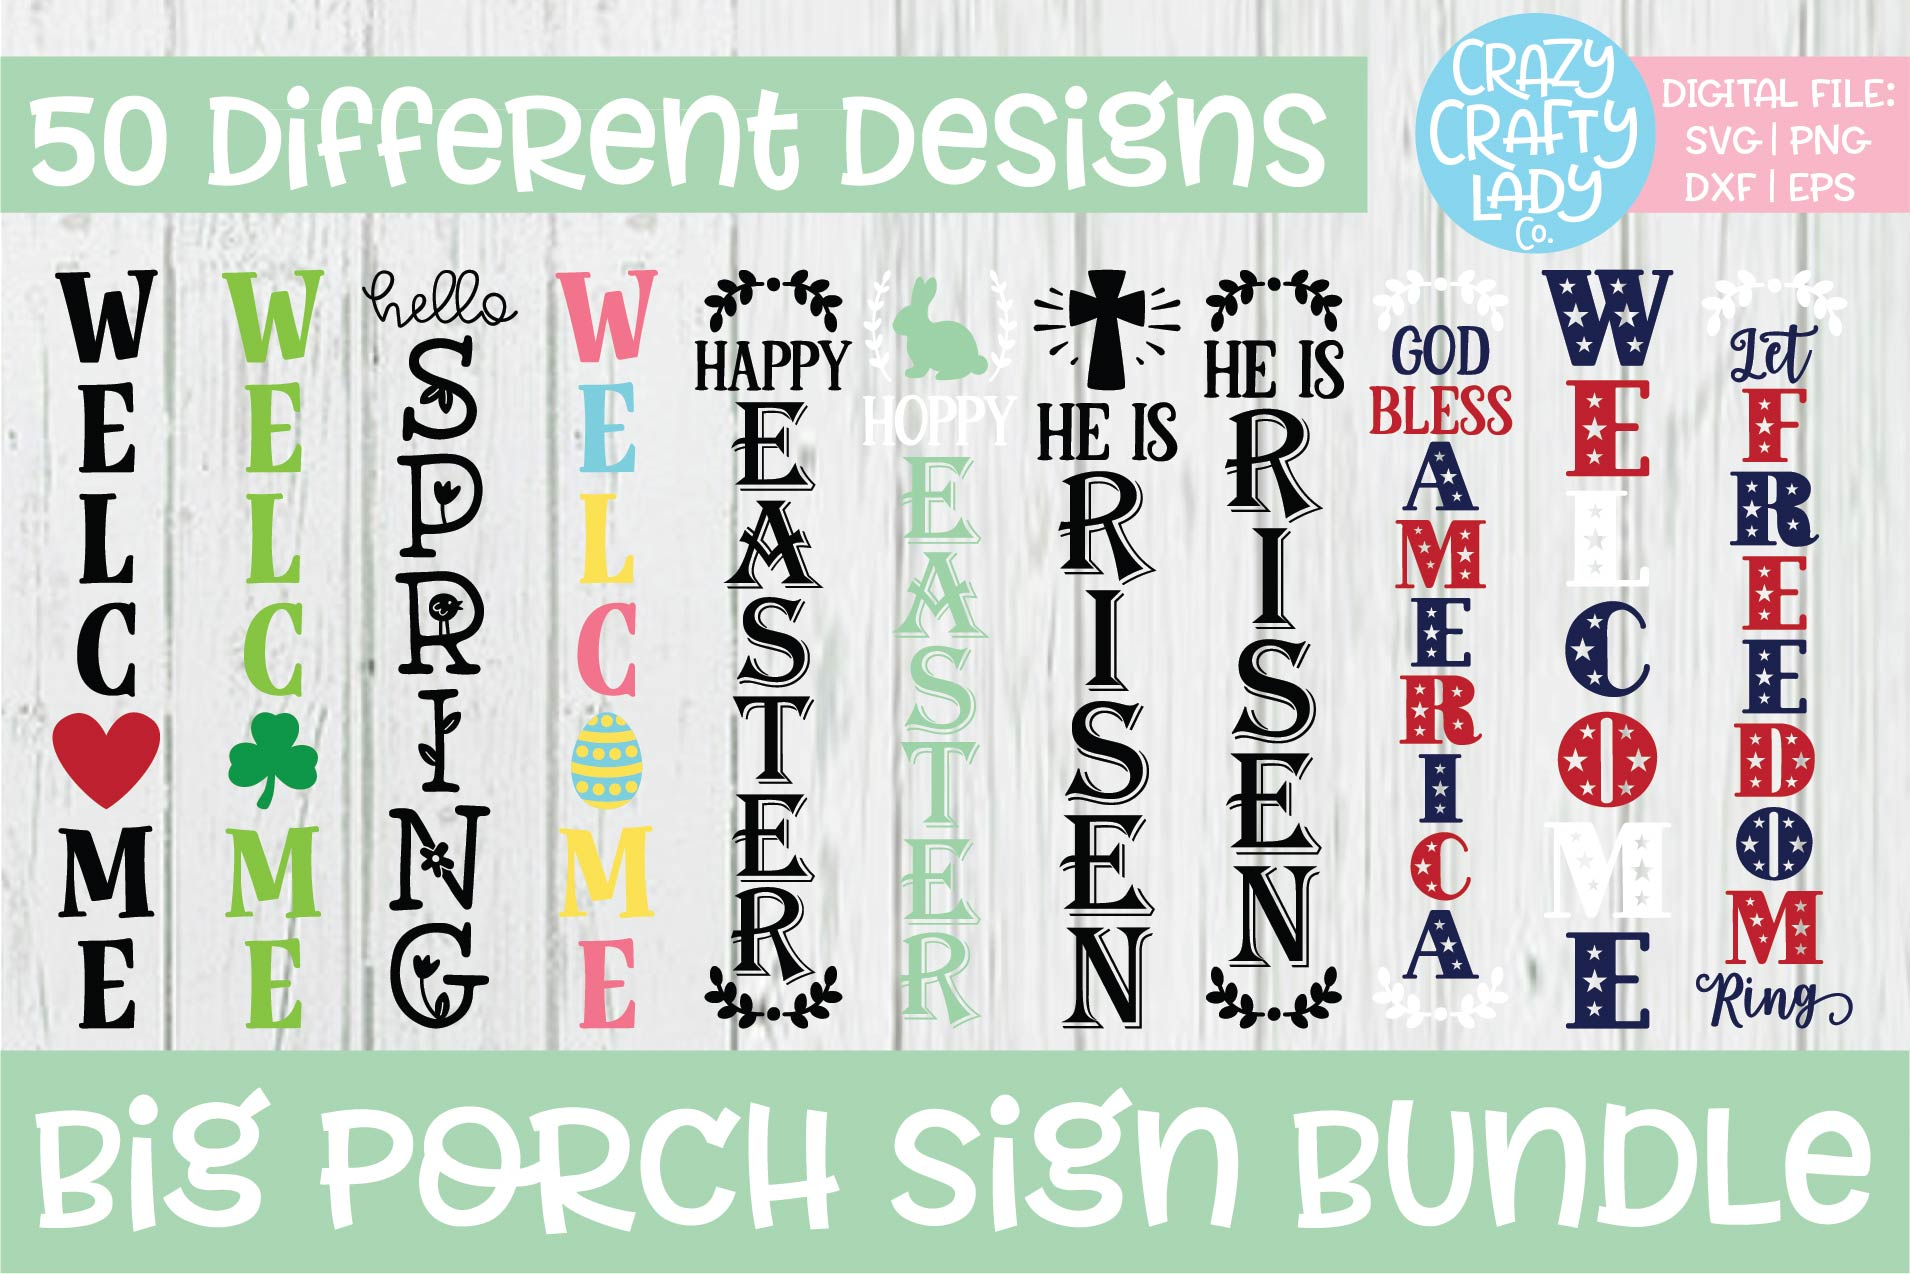 Big Porch Sign SVG DXF EPS PNG Cut File Bundle example image 3